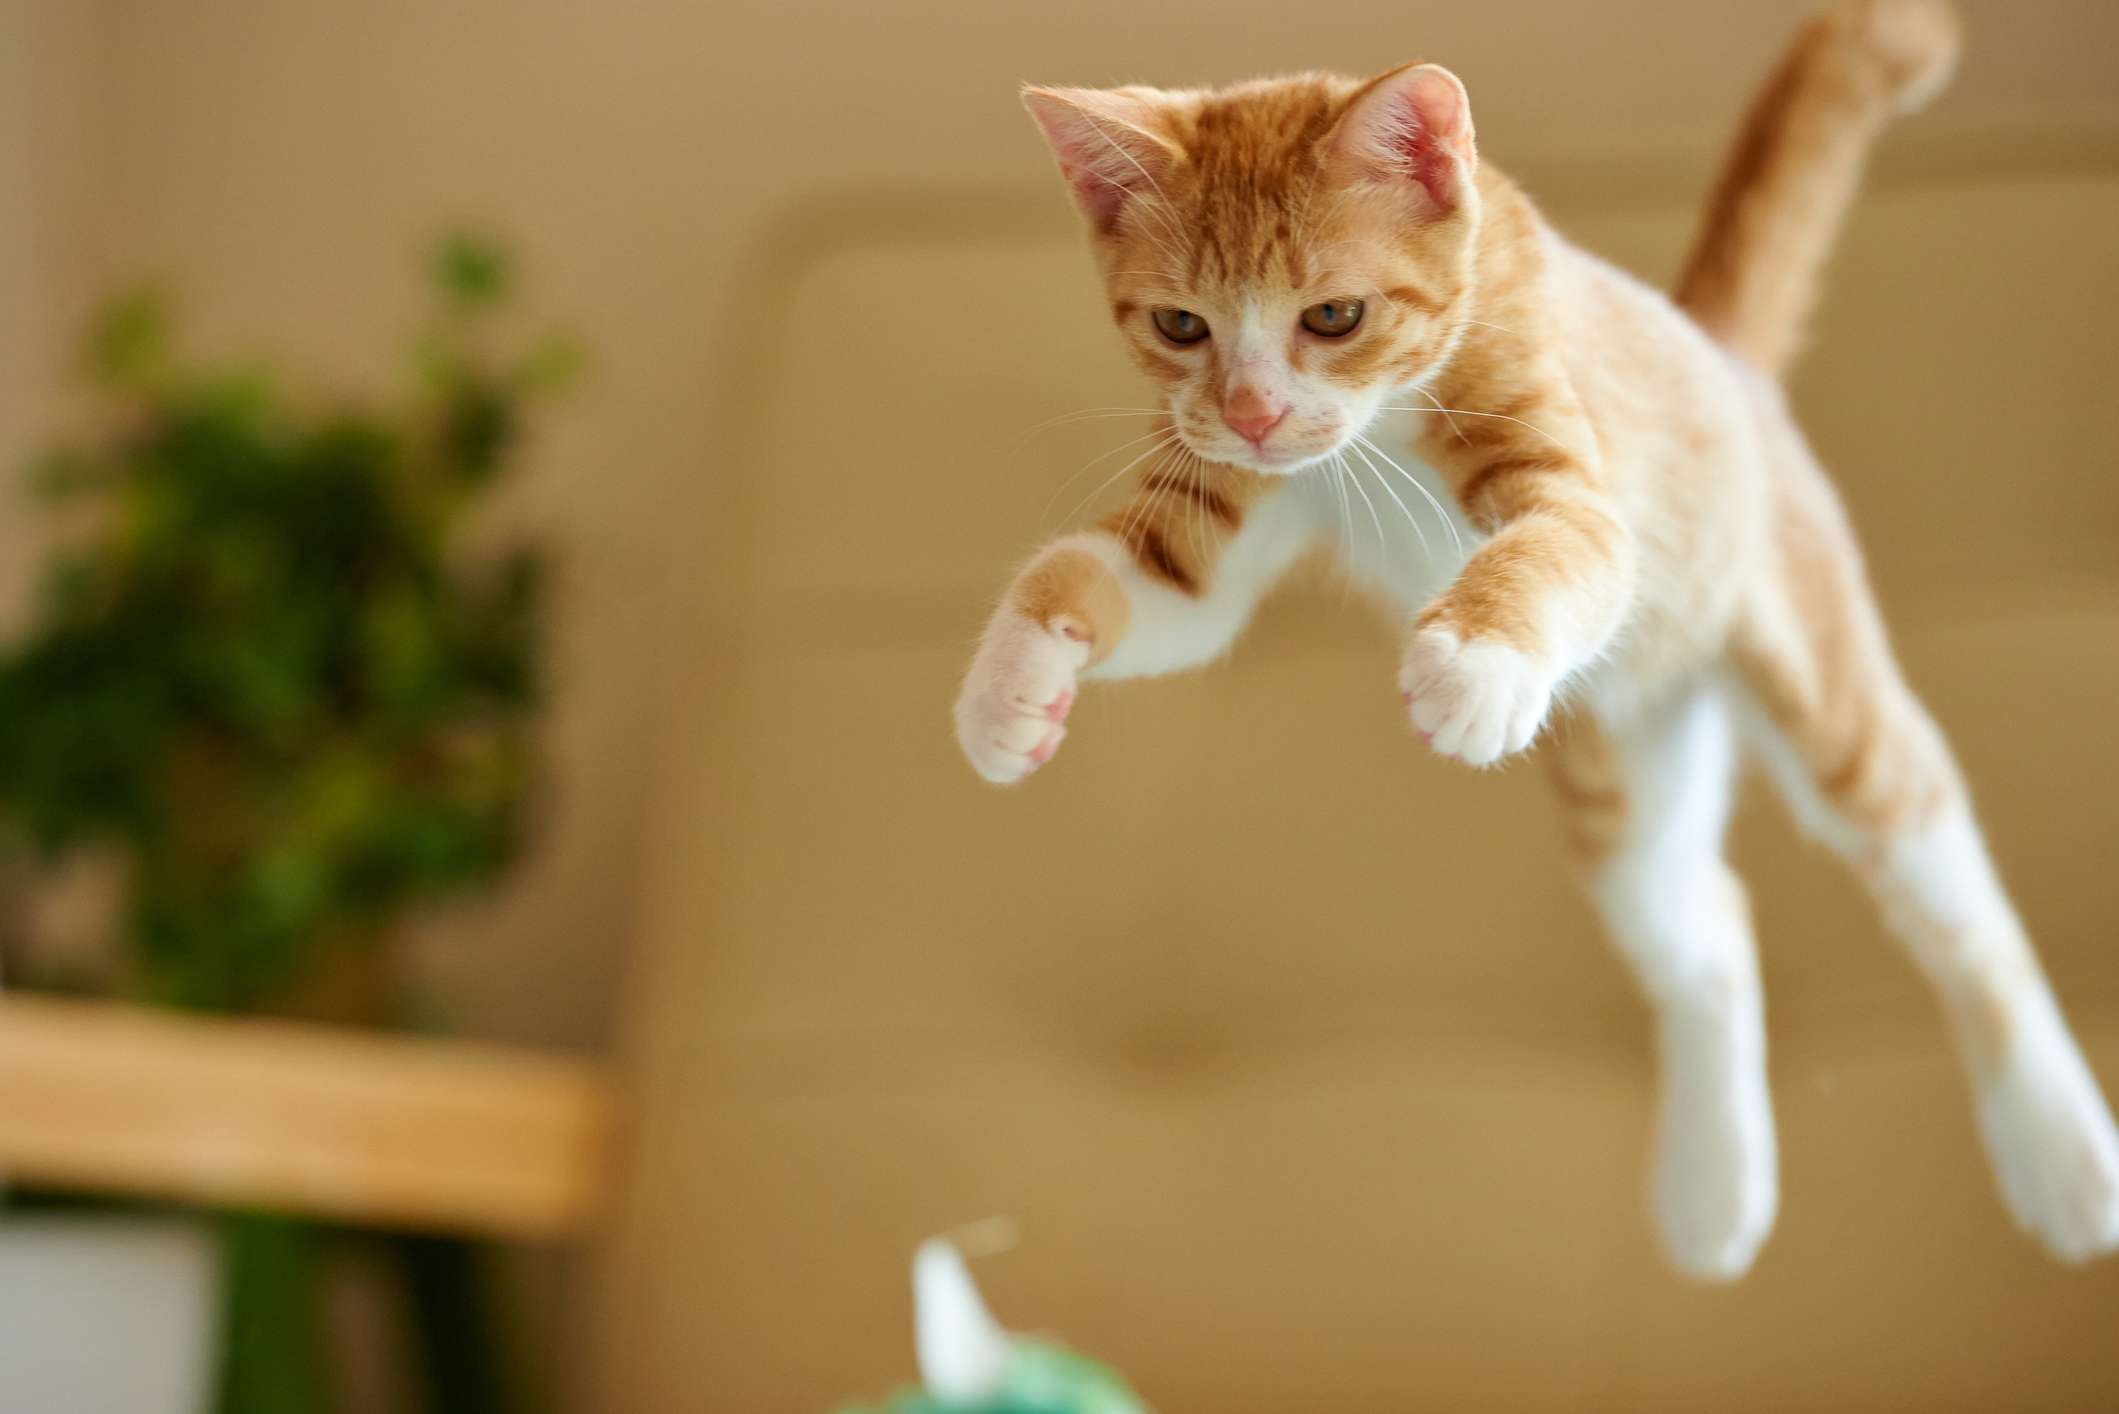 Orange kitten jumping